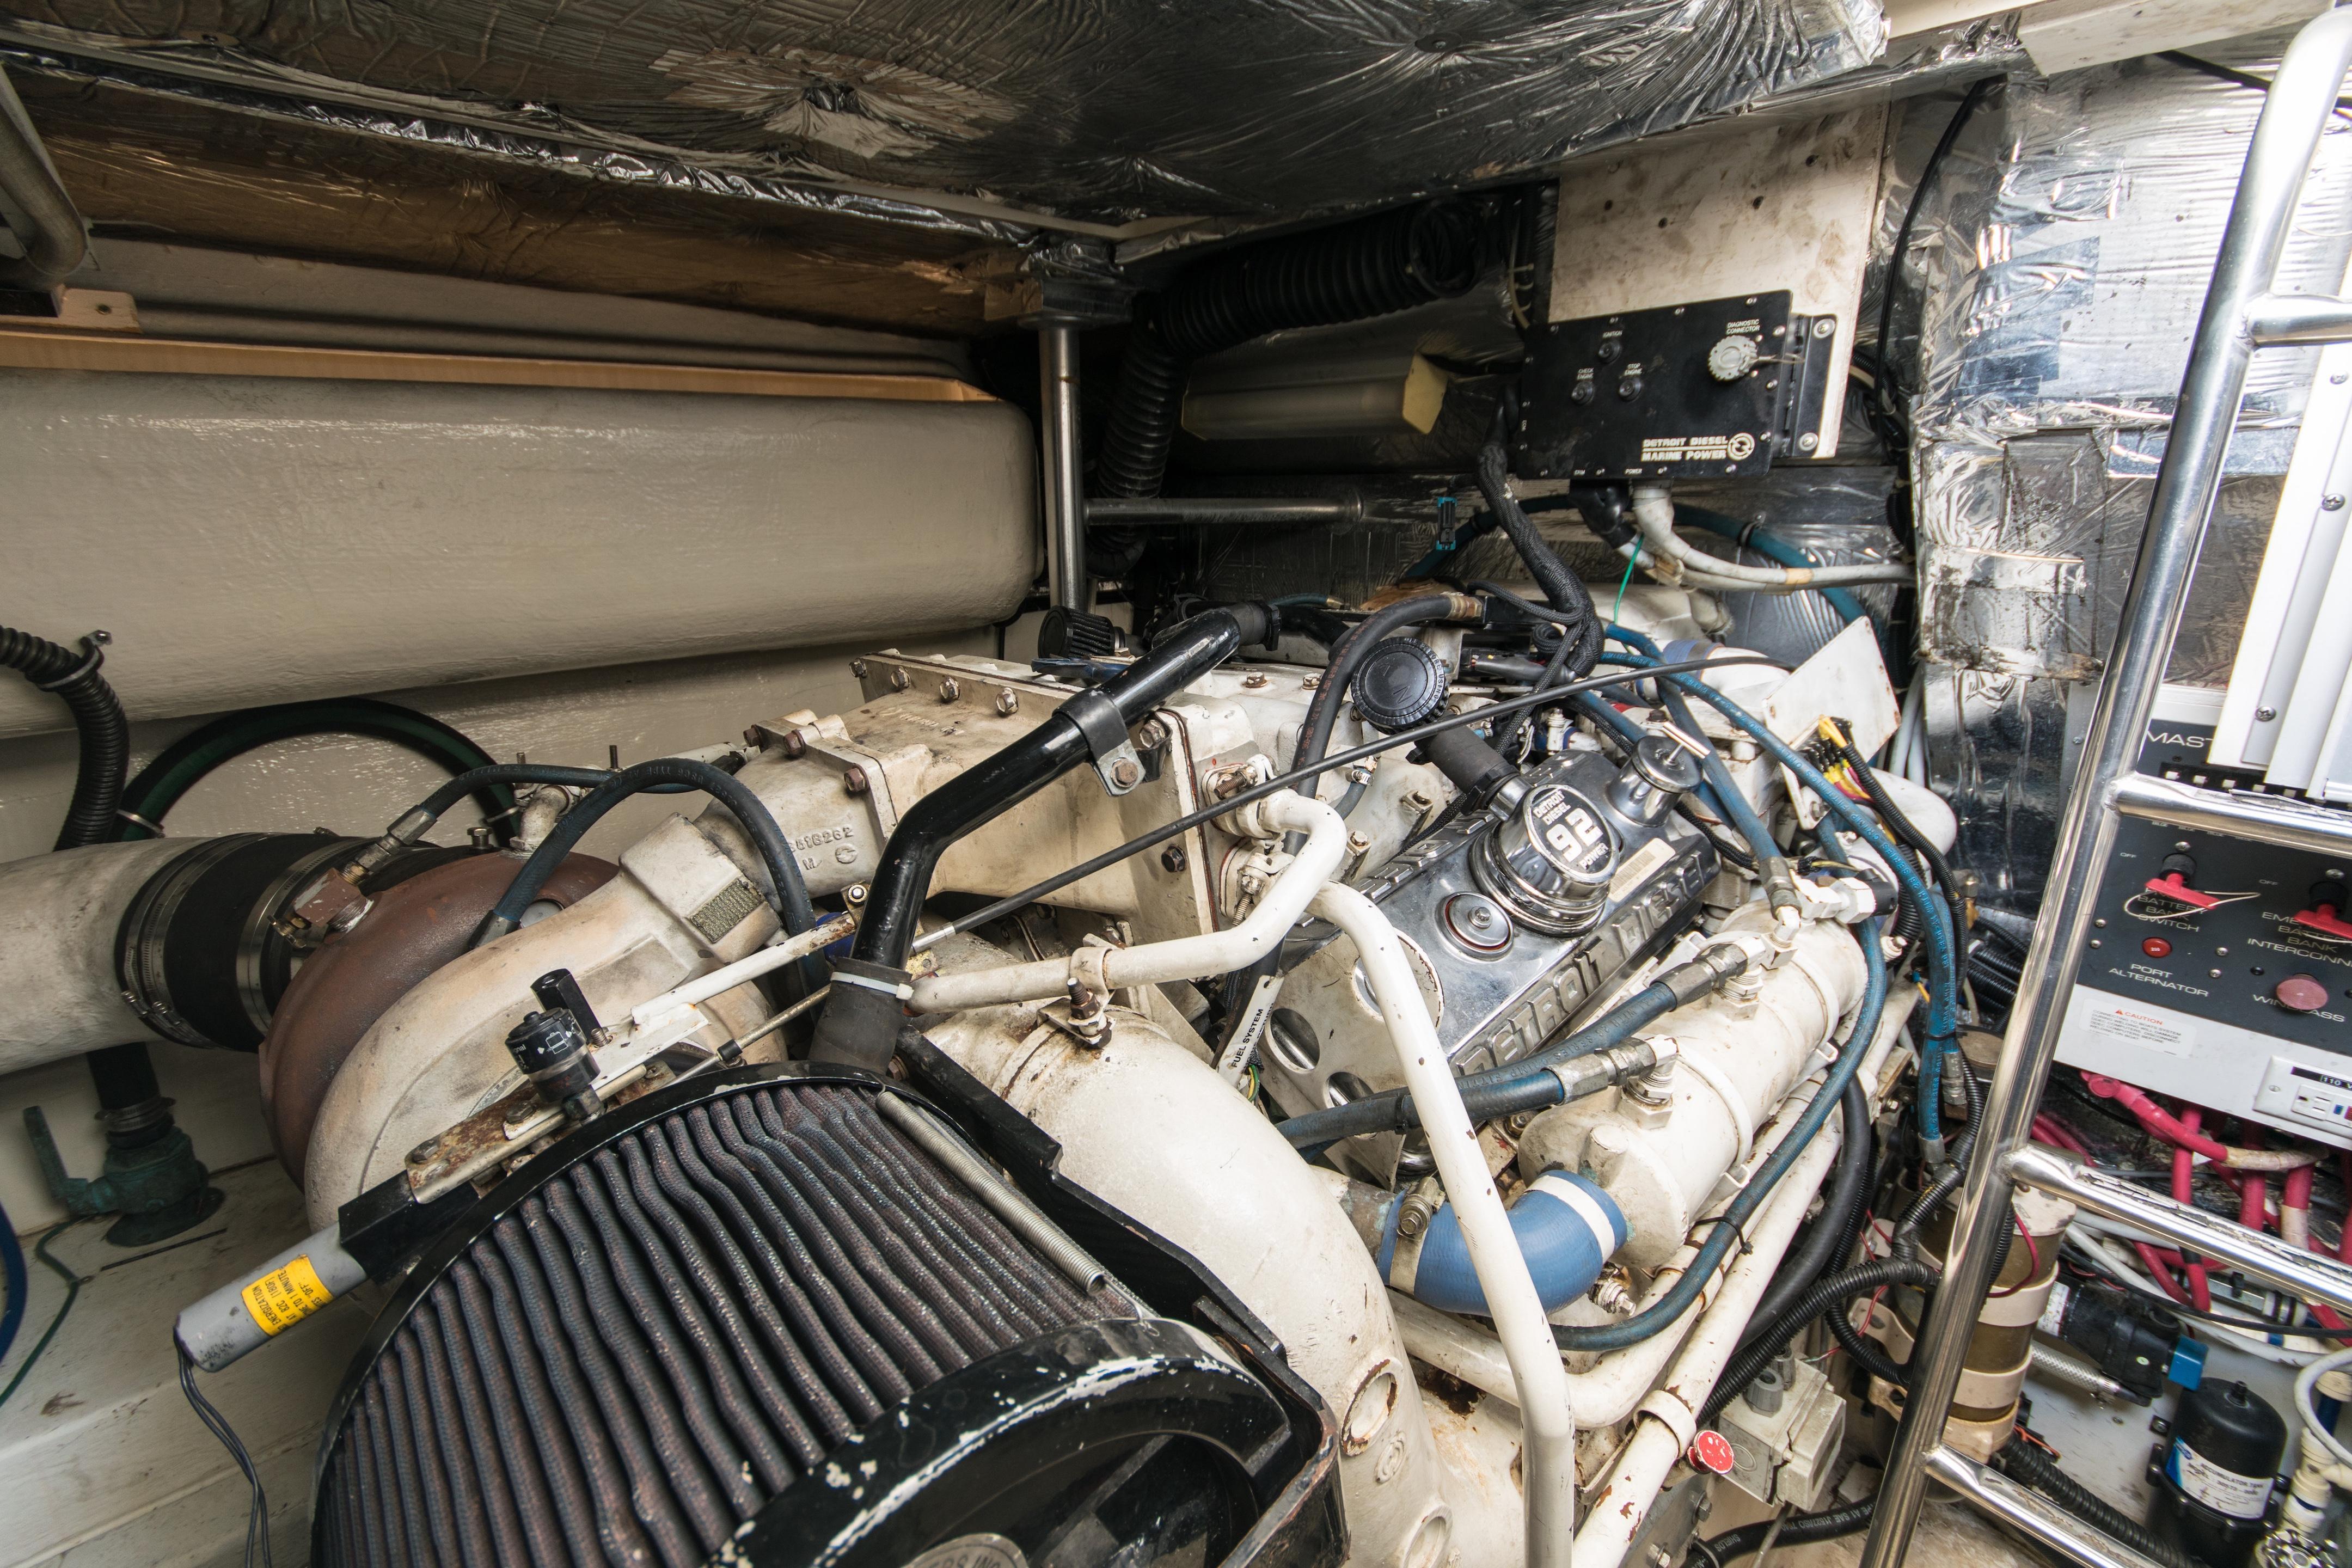 Nauti Buoy Tiara 43 Yachts For Sale Series 53 Detroit Diesel Engine Wiring